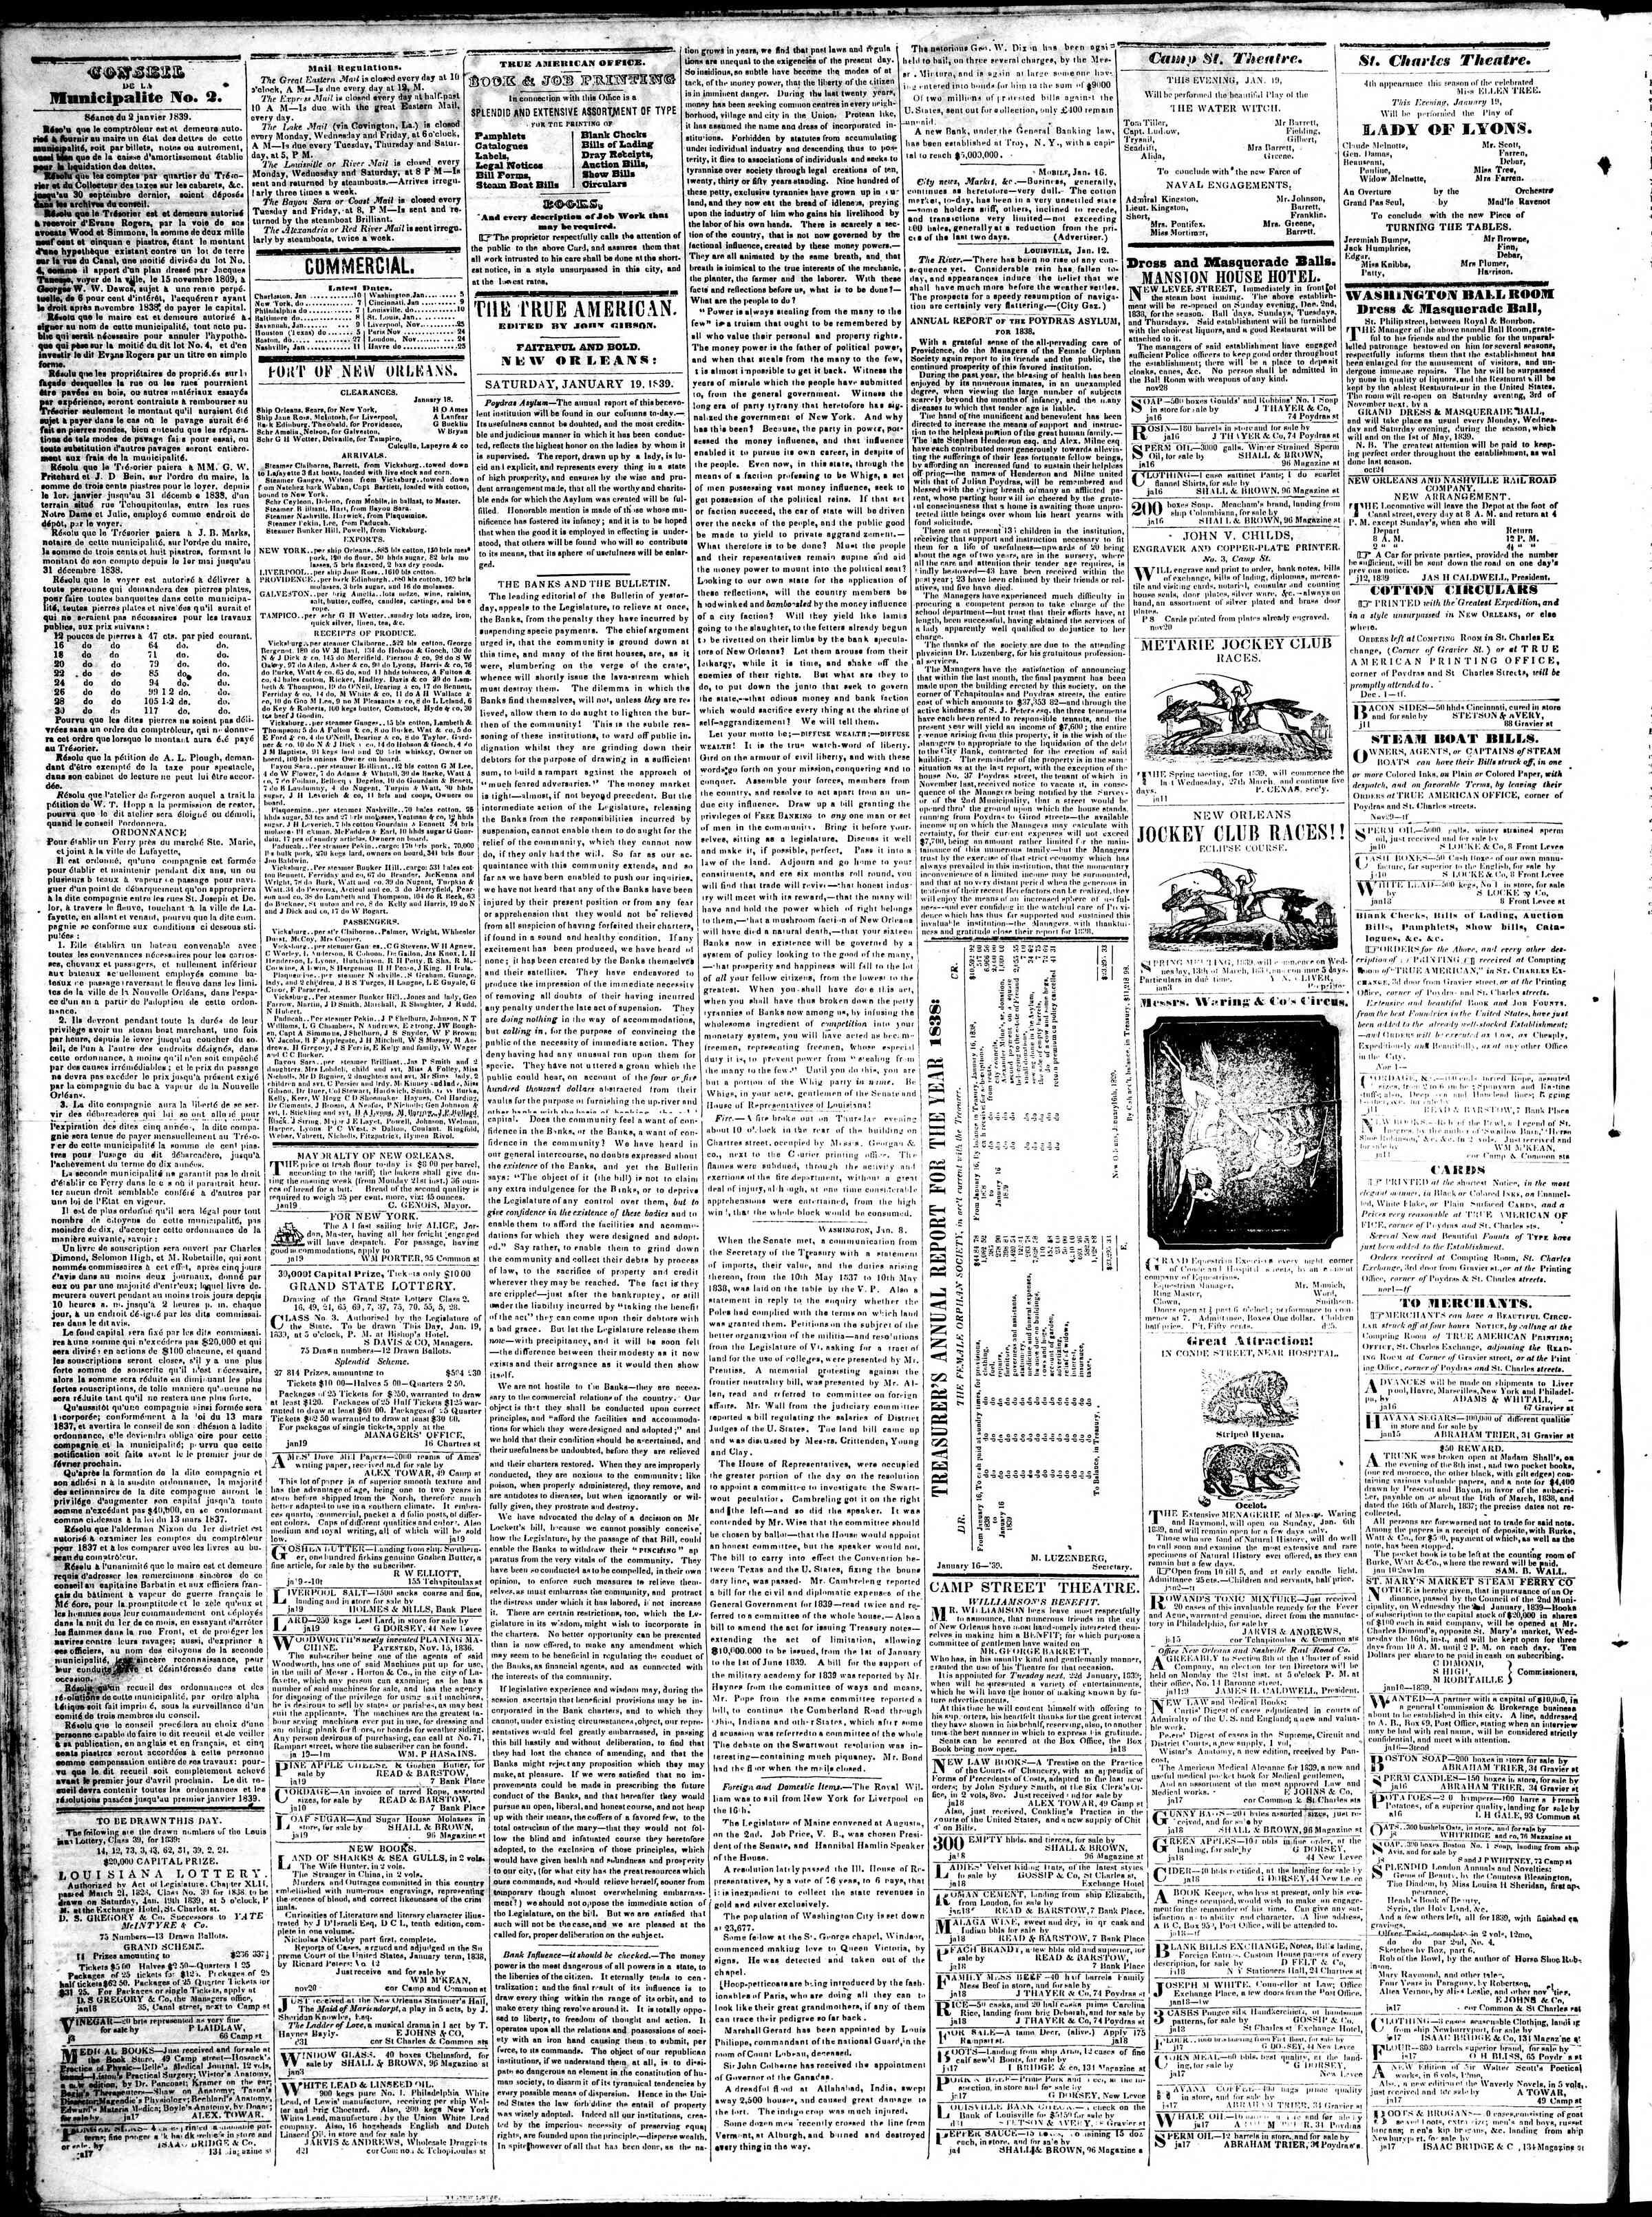 January 19, 1839 Tarihli True American Gazetesi Sayfa 2